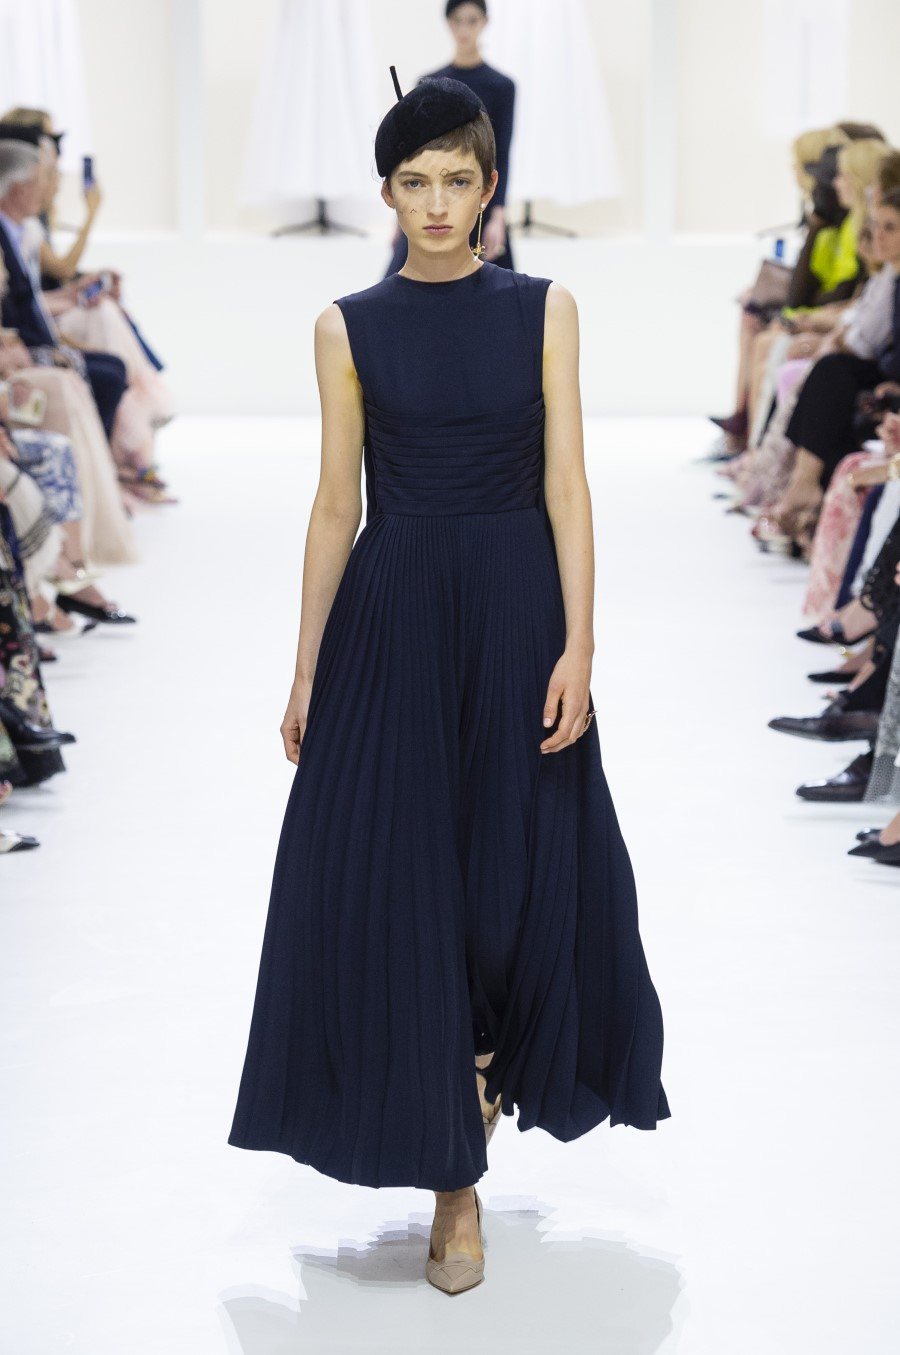 Christian Dior Haute Couture Fall/Winter 2018 ...